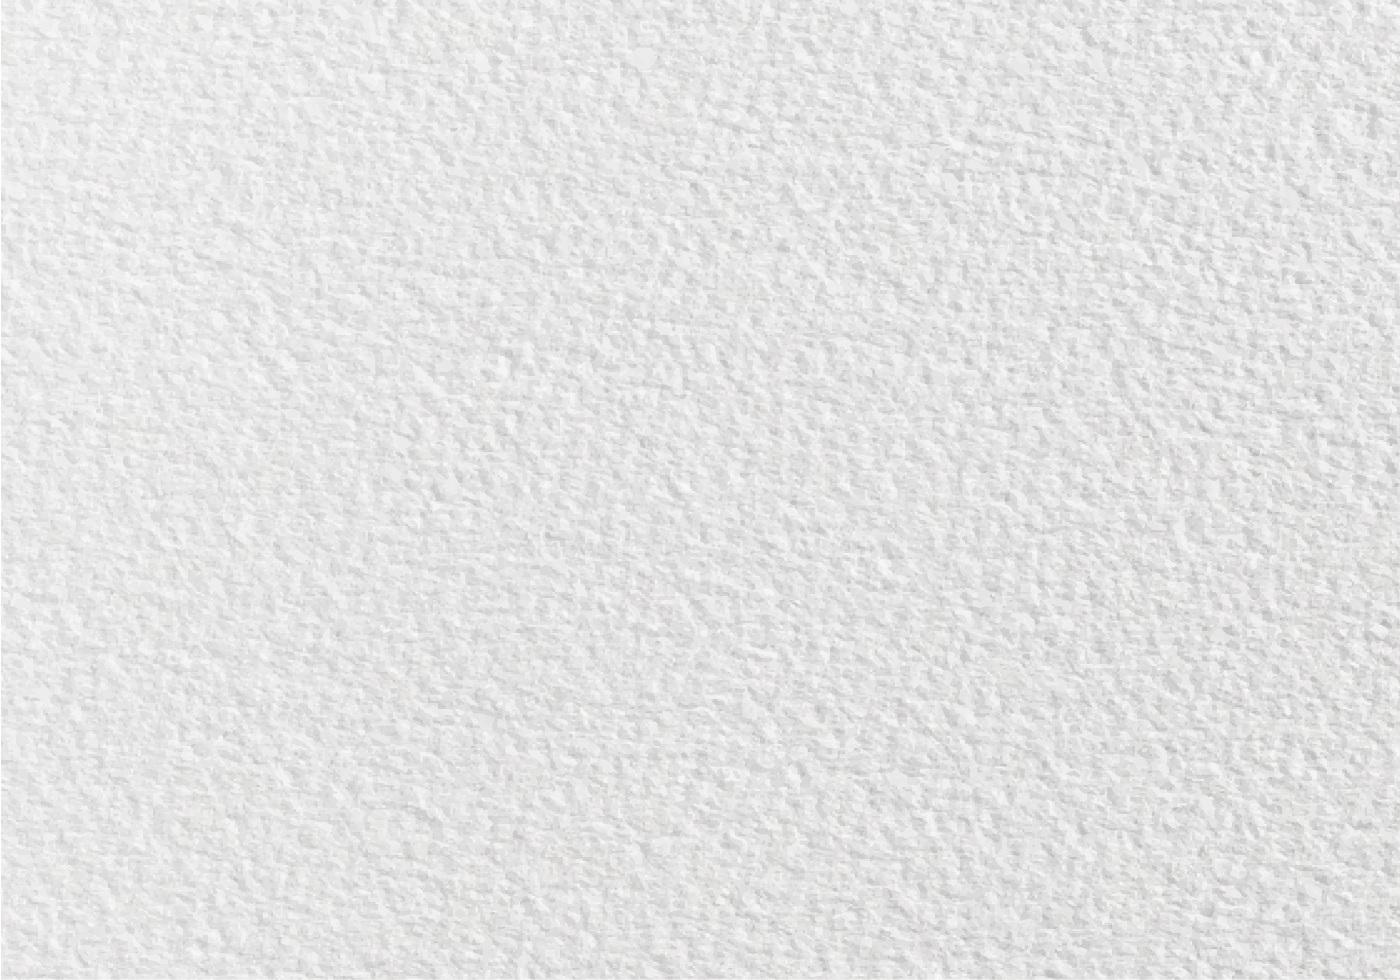 1400x980 Vector Watercolor Paper Texture